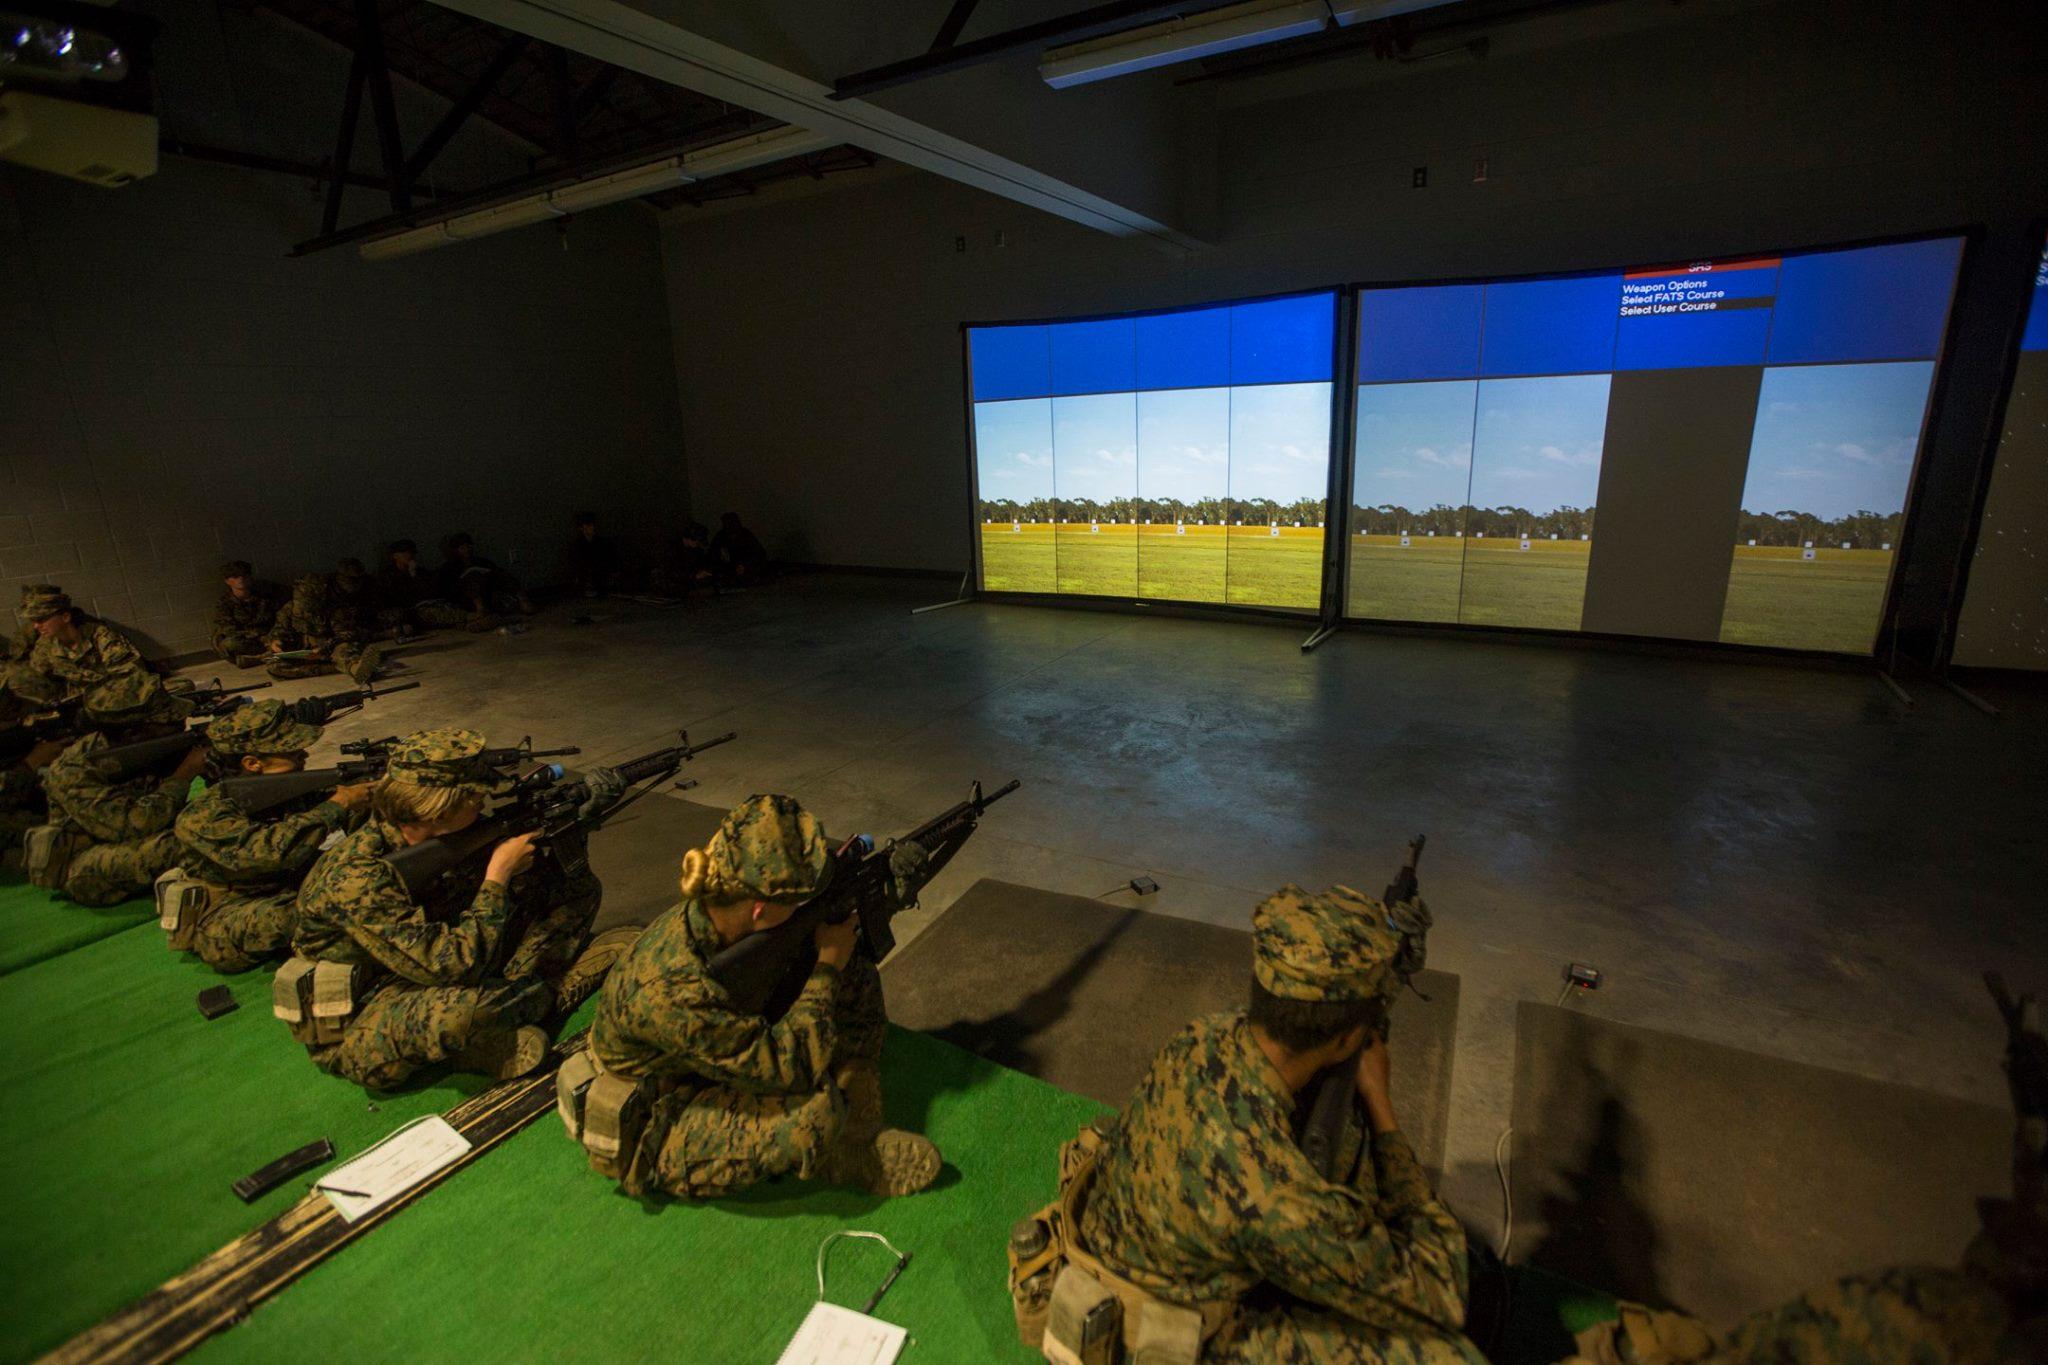 U.S. Marine Corps Indoor Simulated Marksmanship Trainer (ISMT)